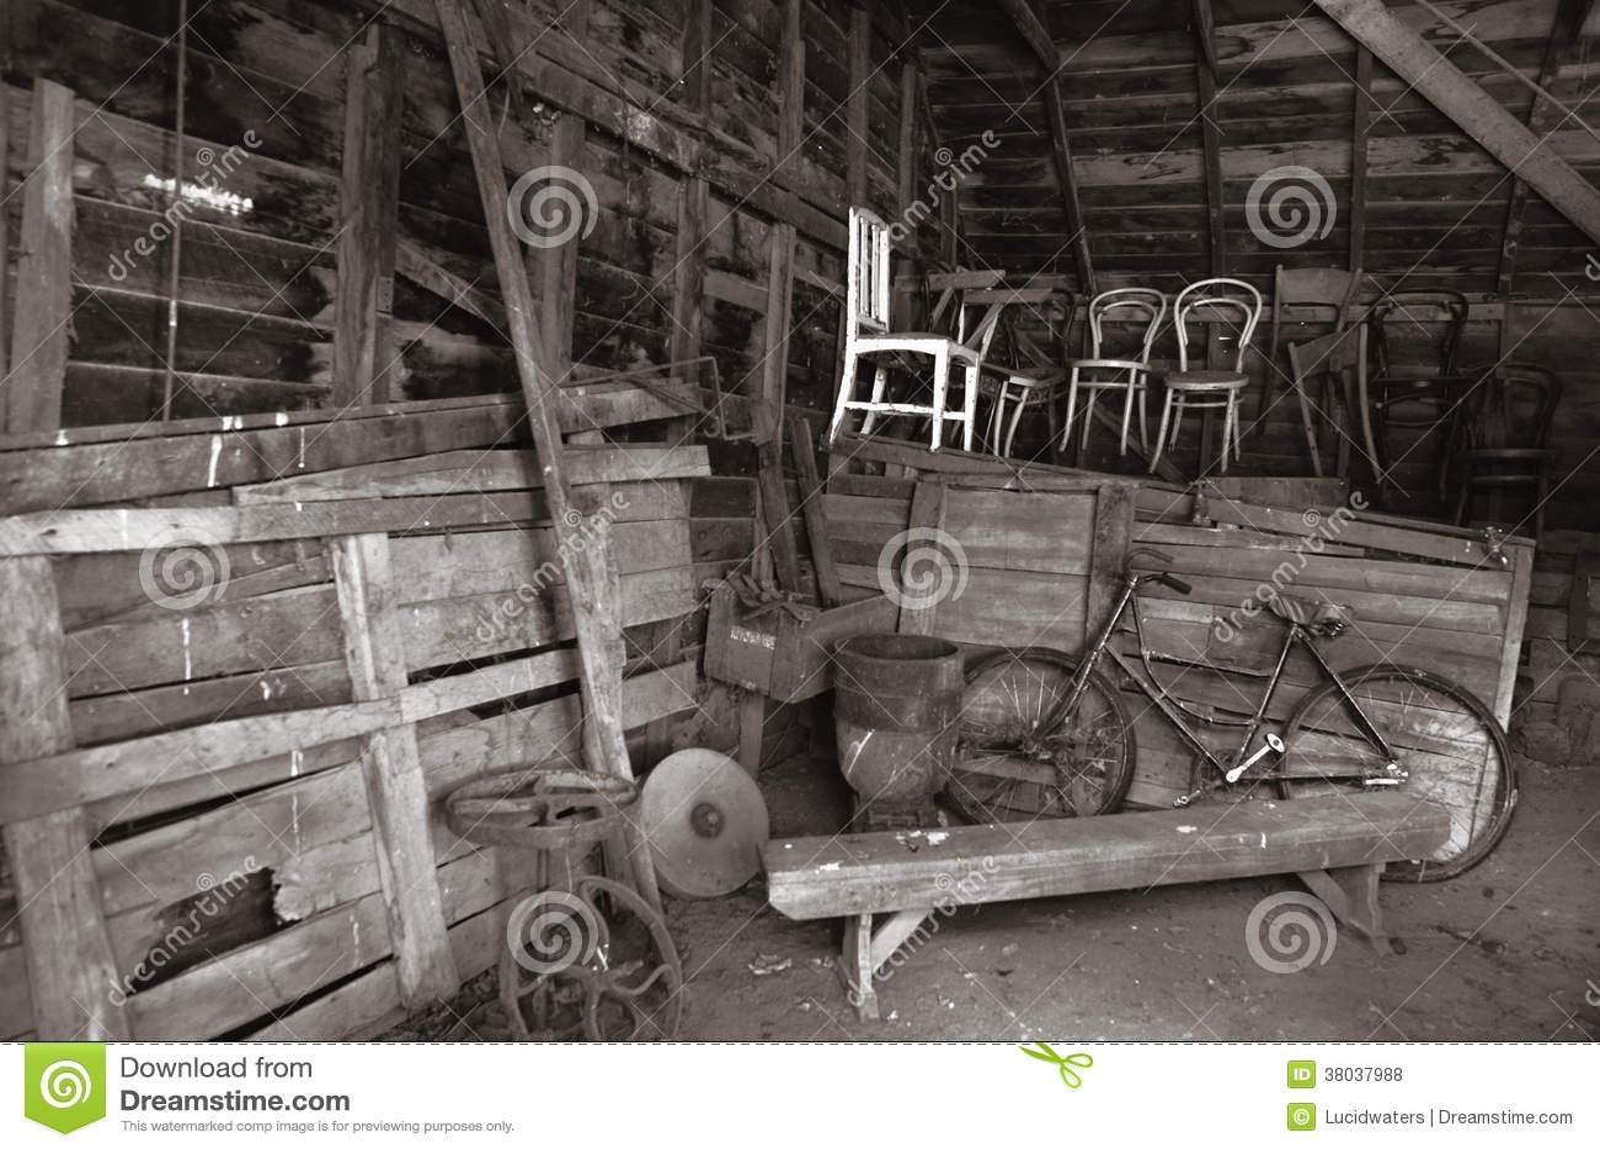 old barn interior royalty free stock photos image 38037988 barn bike farm interior